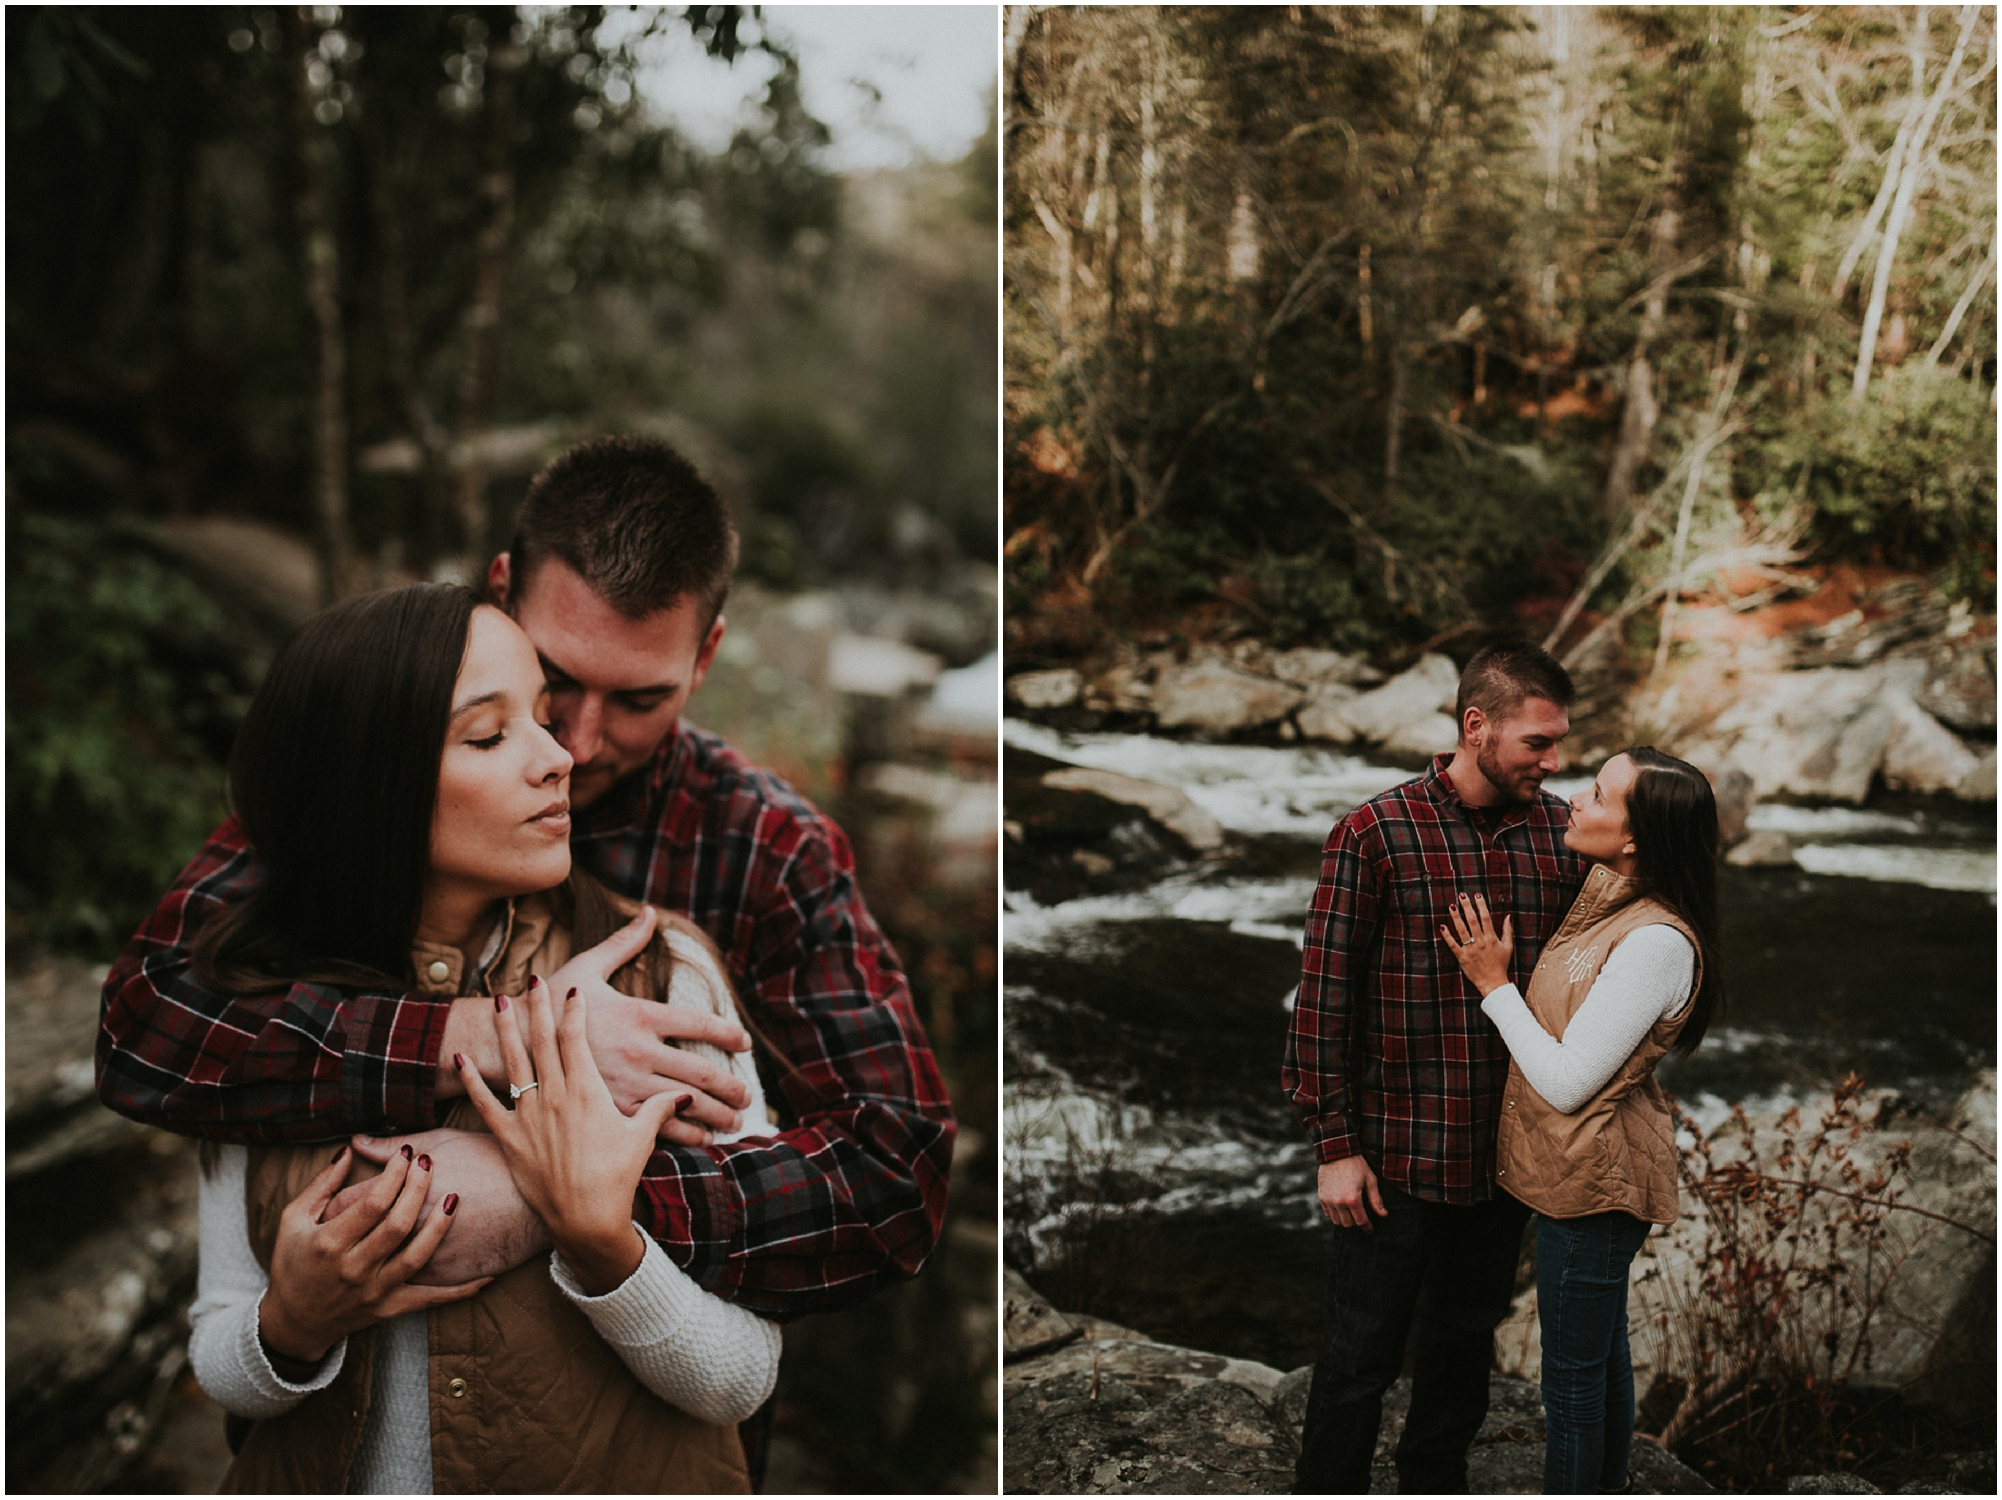 Linville-Falls-Engagement-avonne-Photography-53.jpg